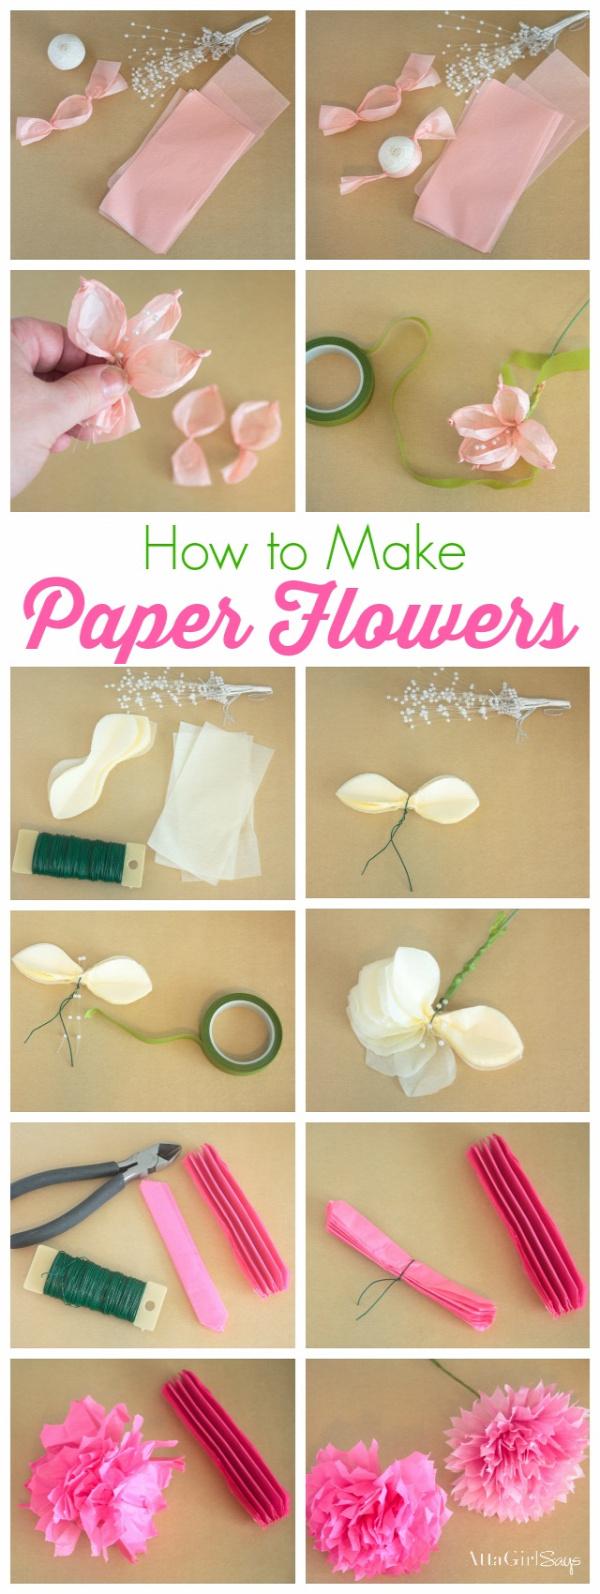 papírvirág papírvirág készítés tavasz